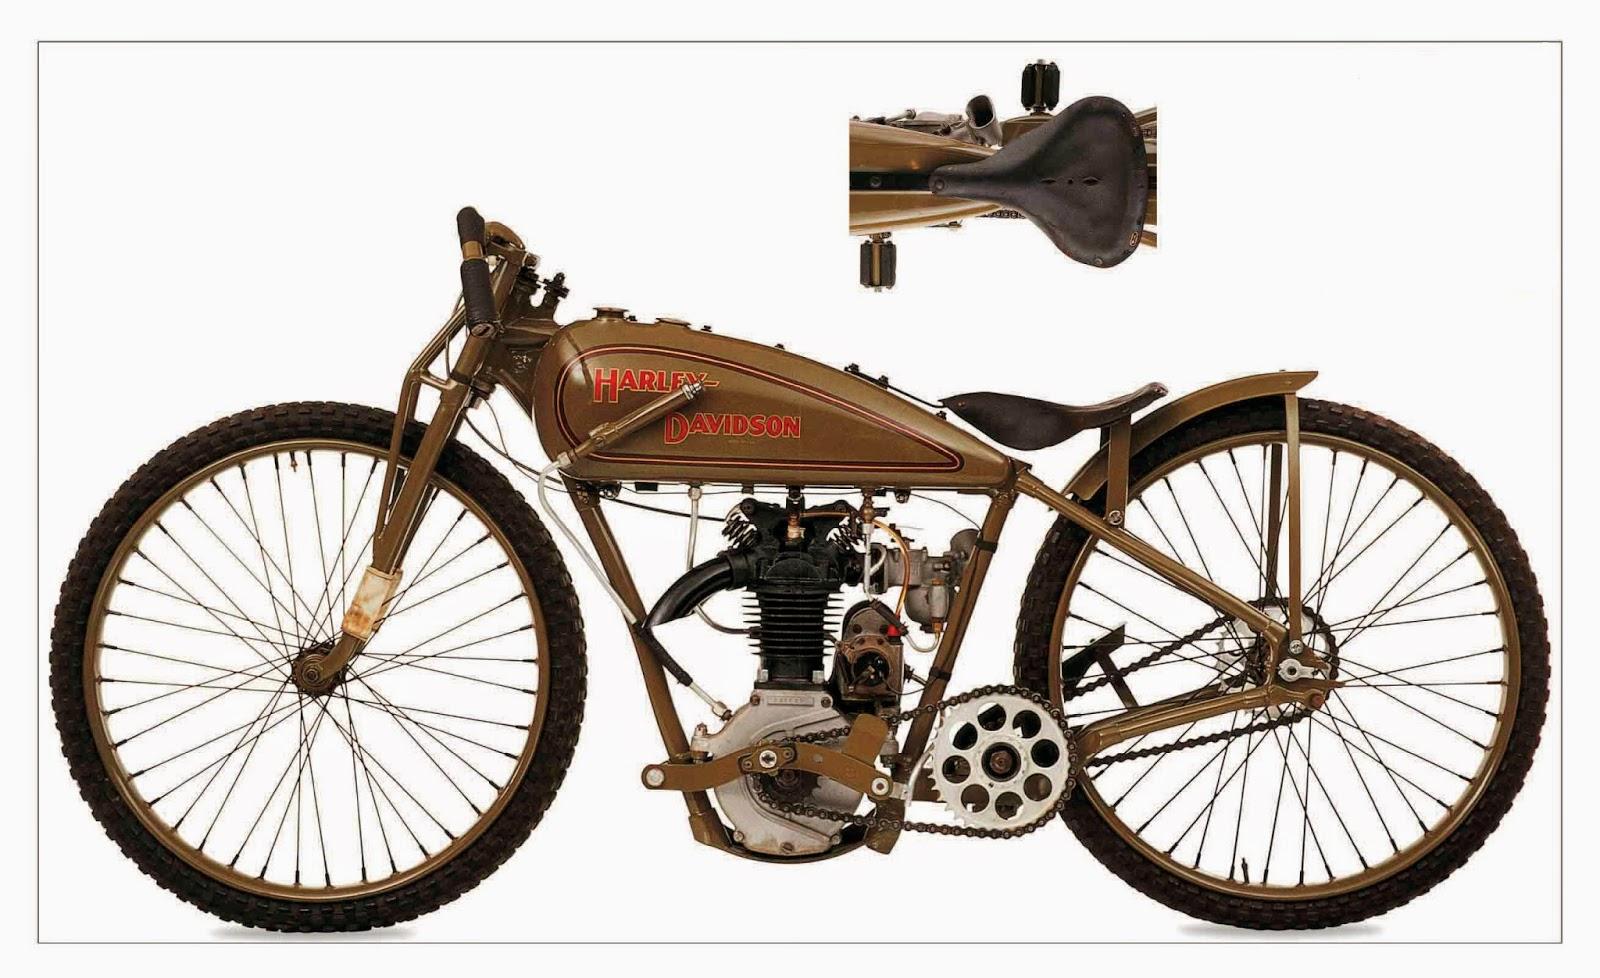 Harley-Davidson 1926 Model S Racer